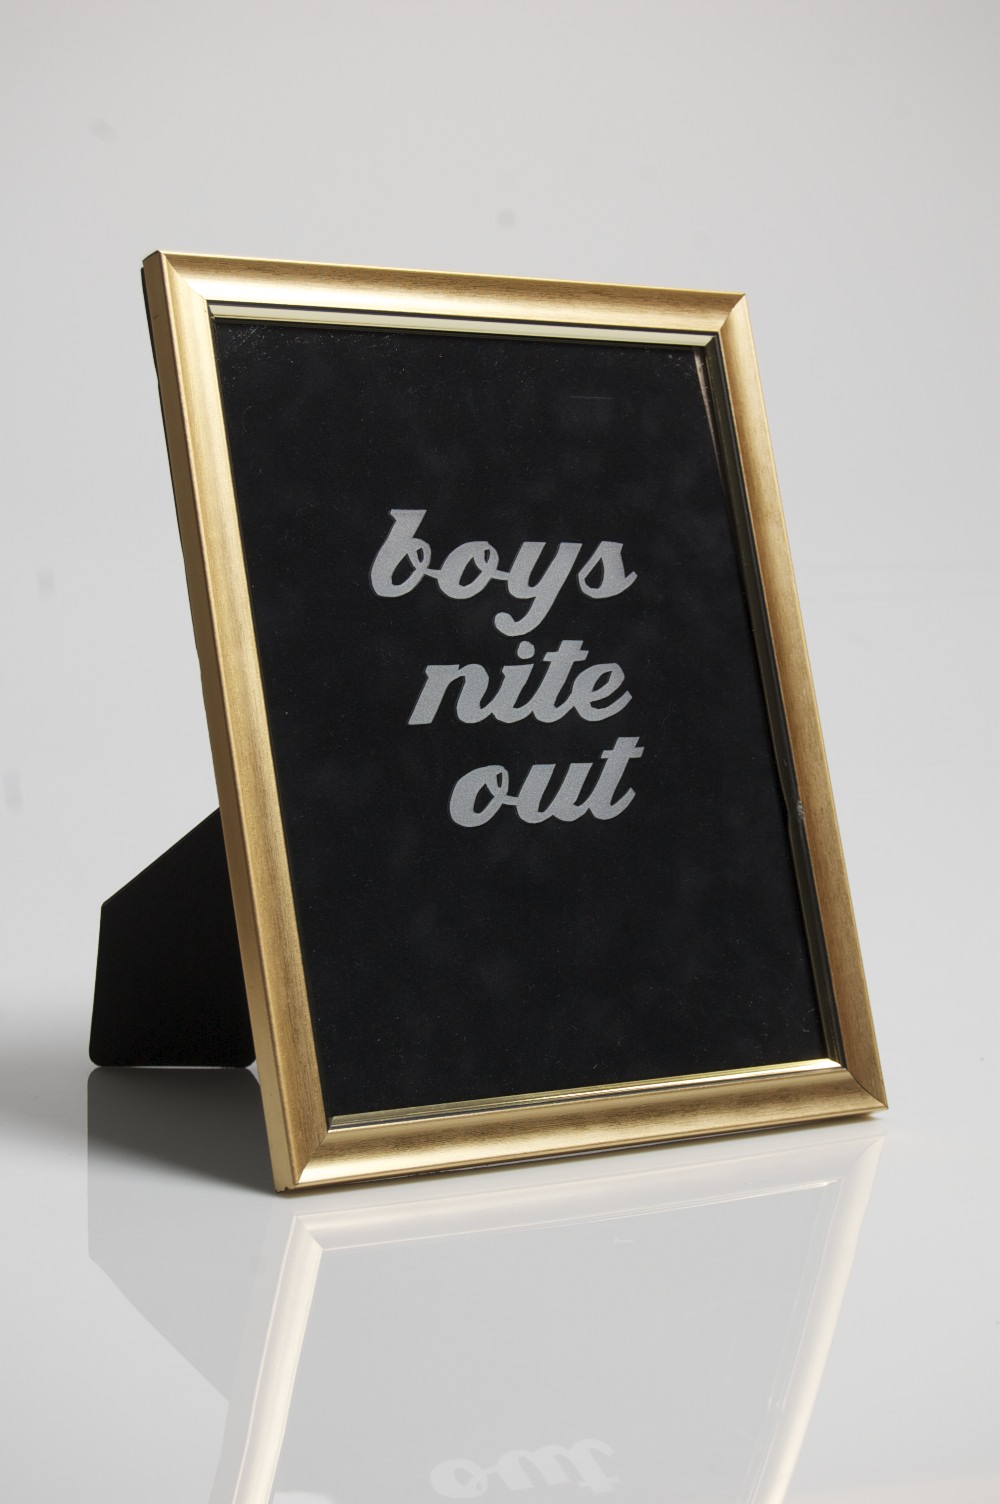 boys nite out